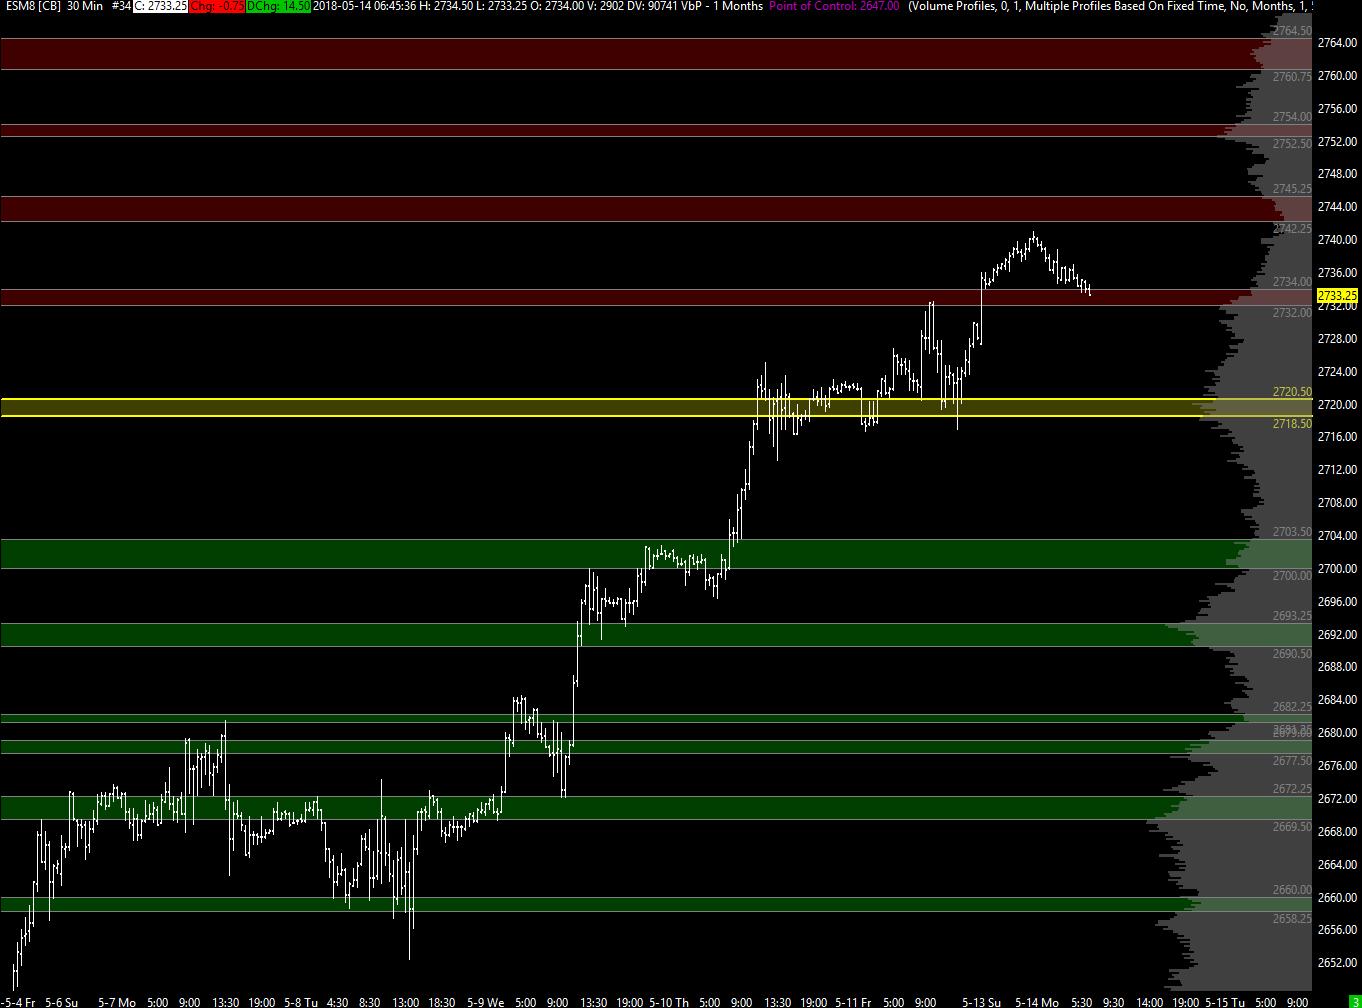 Screenshot 05-14-2018 12.45.49.png